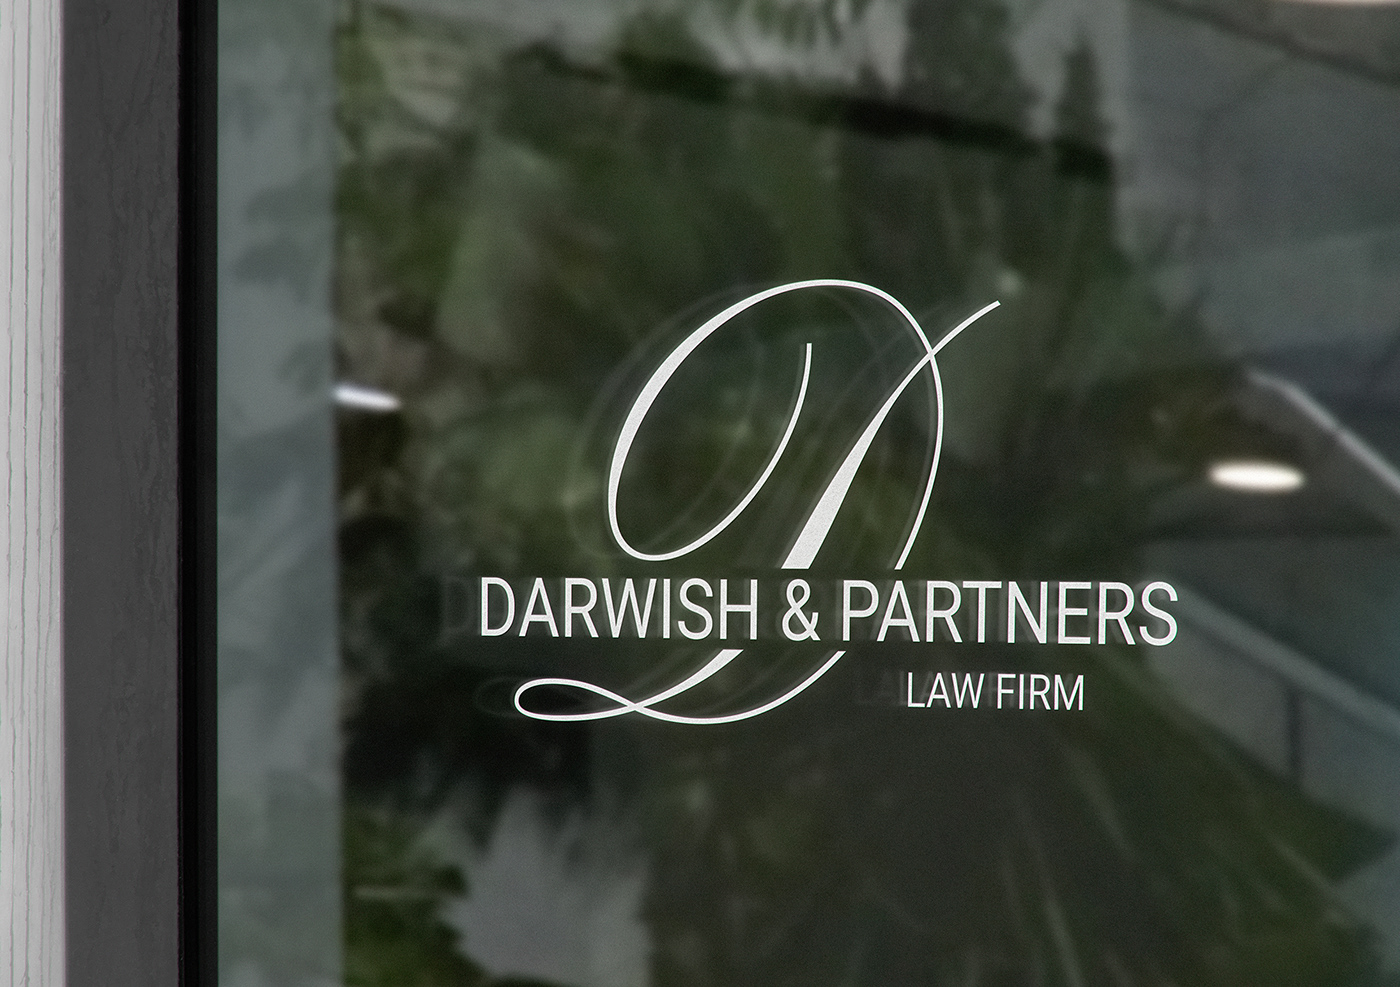 branding  colors graphic design  law firm law logo logo logo animation Logo Design